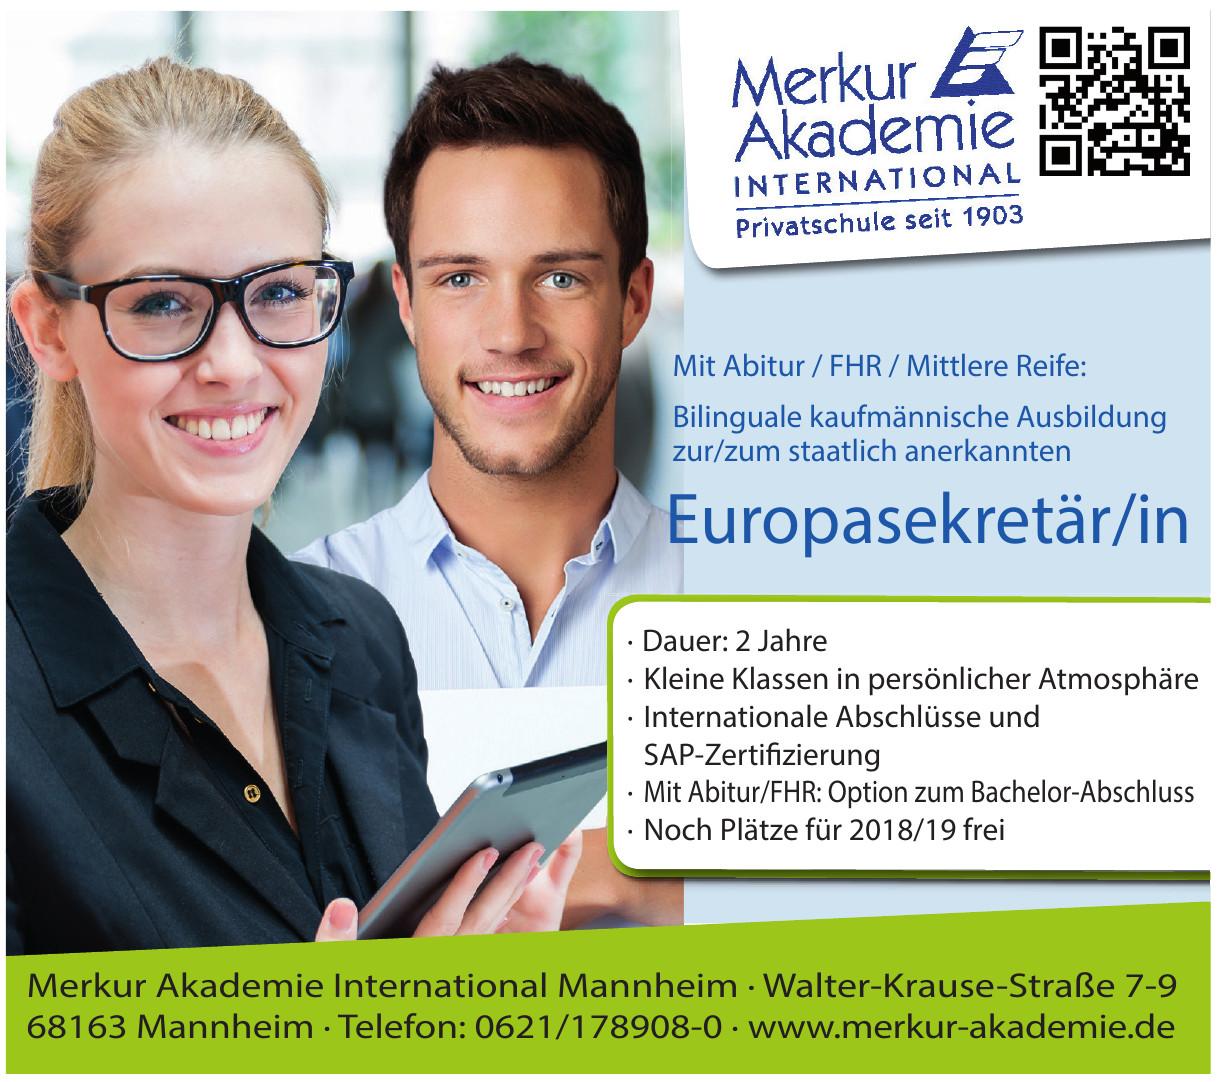 Merkur Akademie International Mannheim